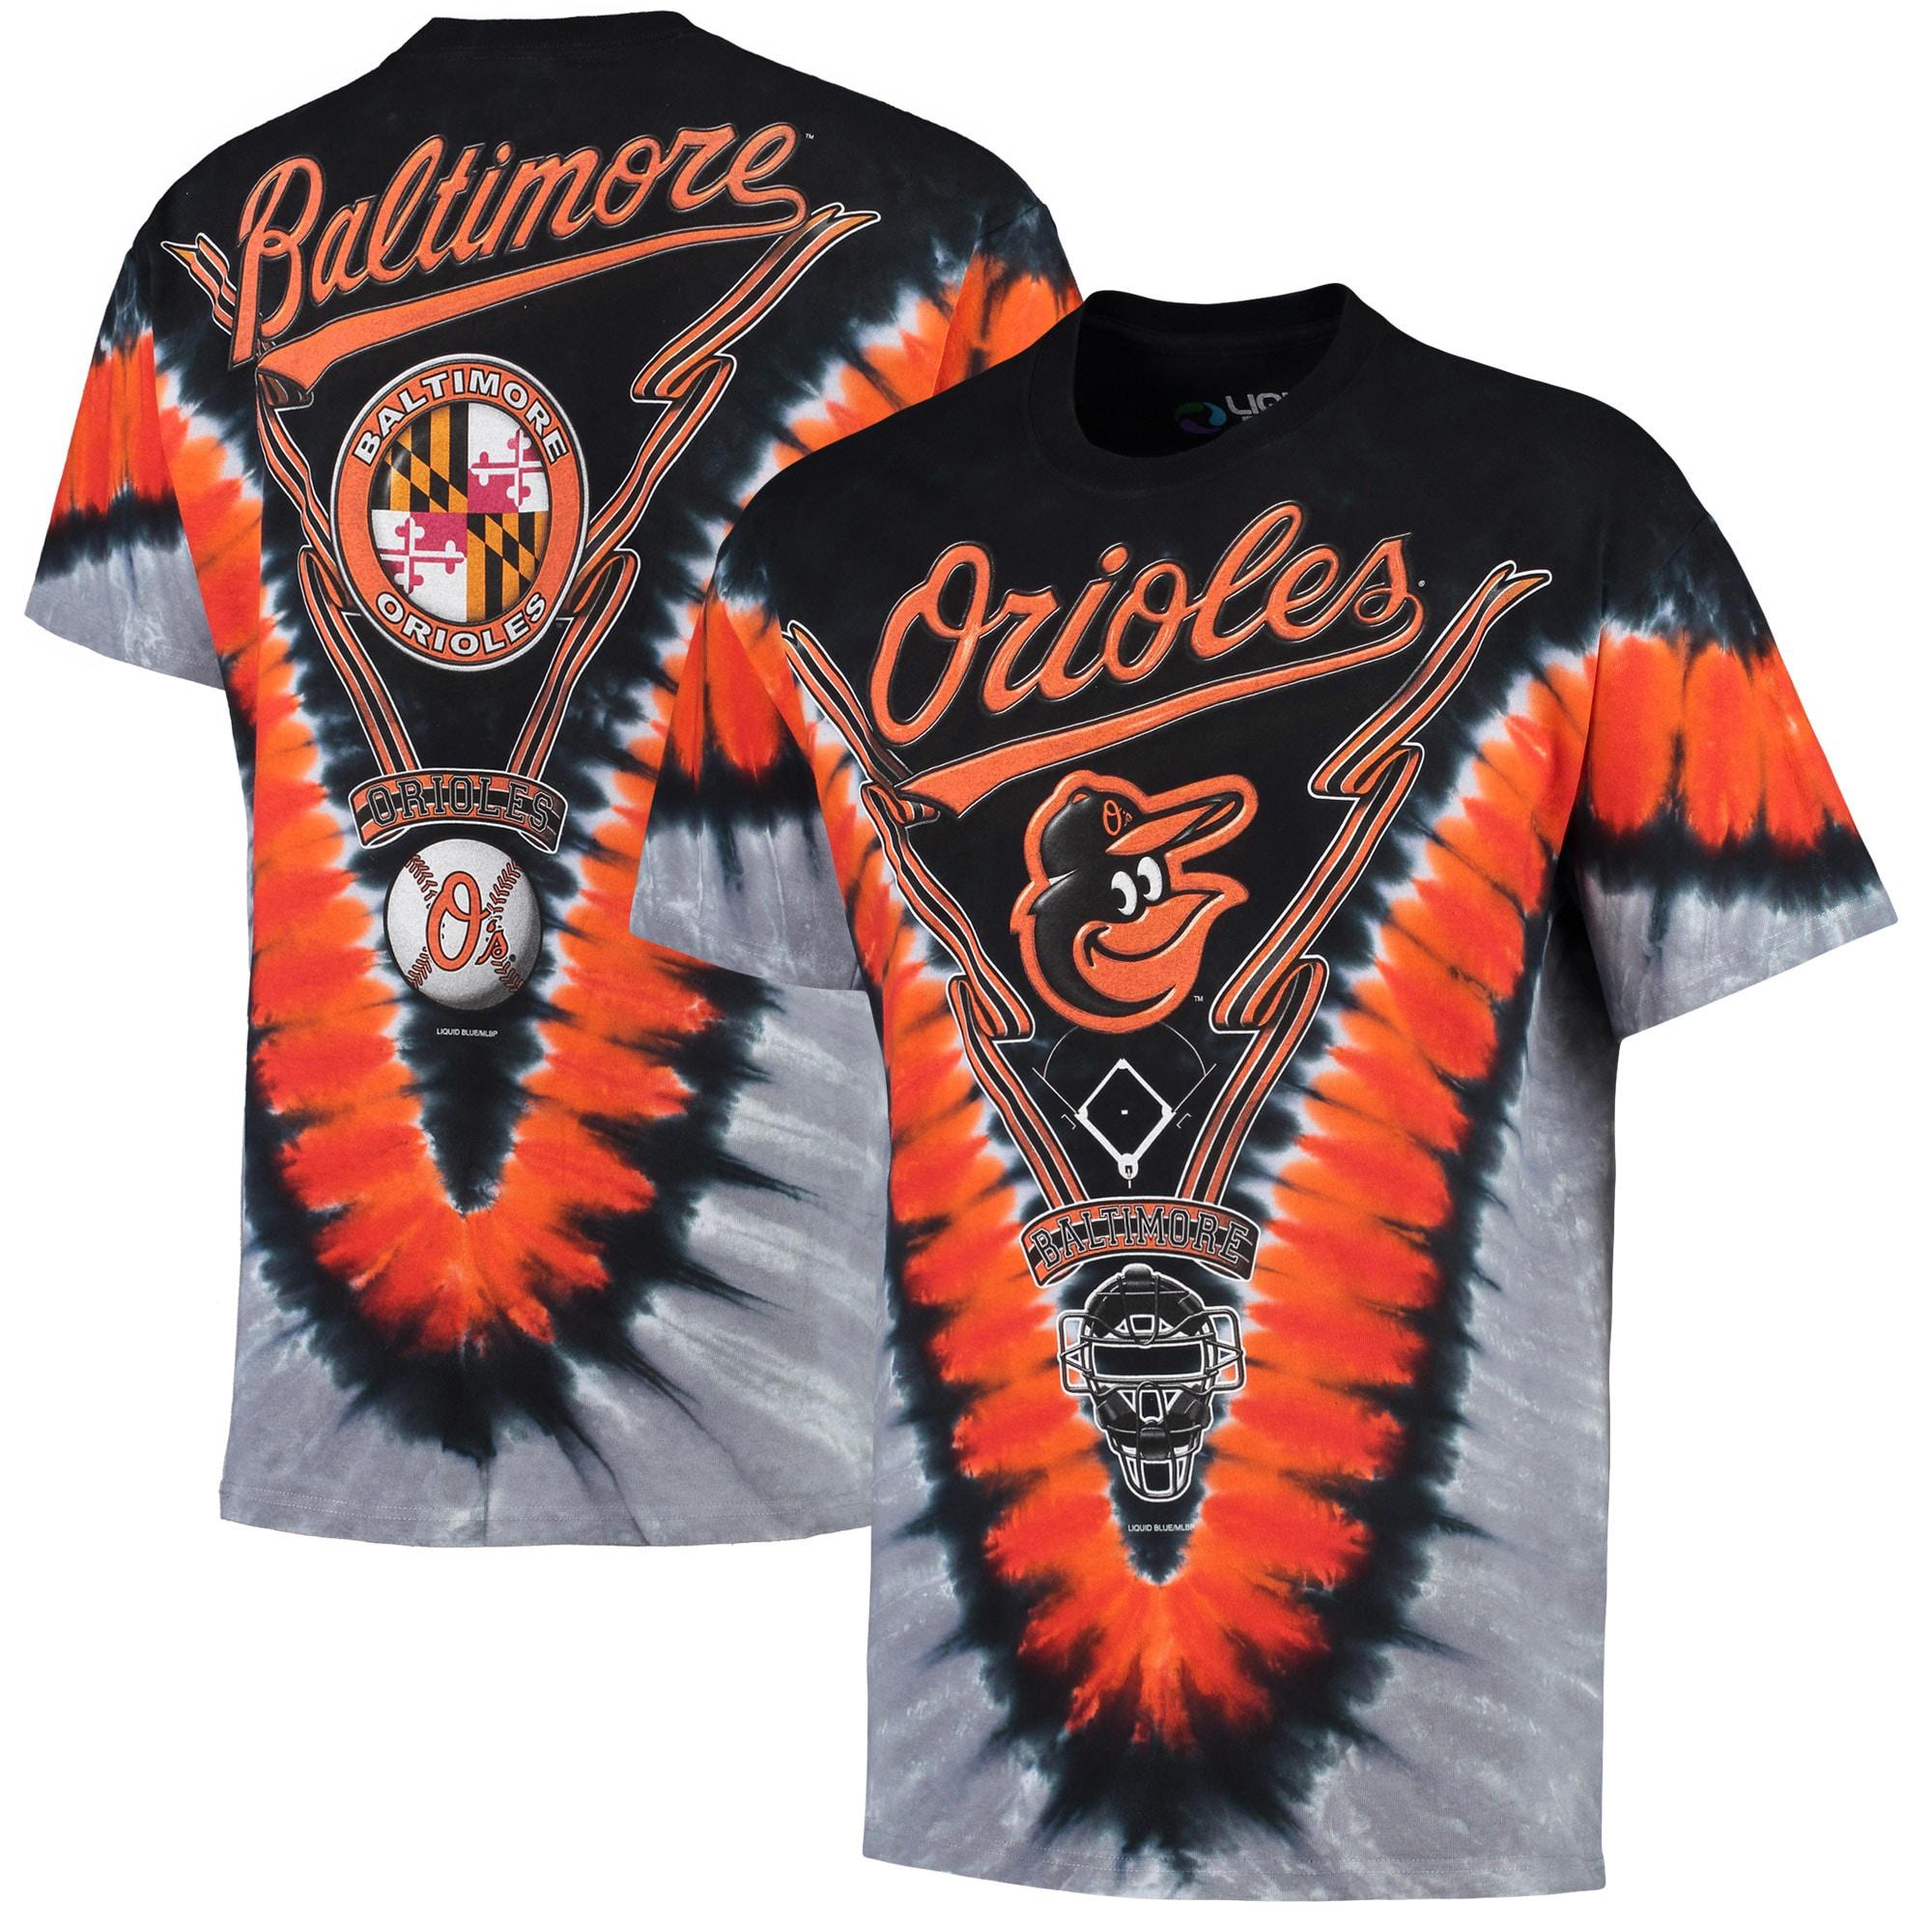 Baltimore Orioles V Tie-Dye T-Shirt - Black/Orange